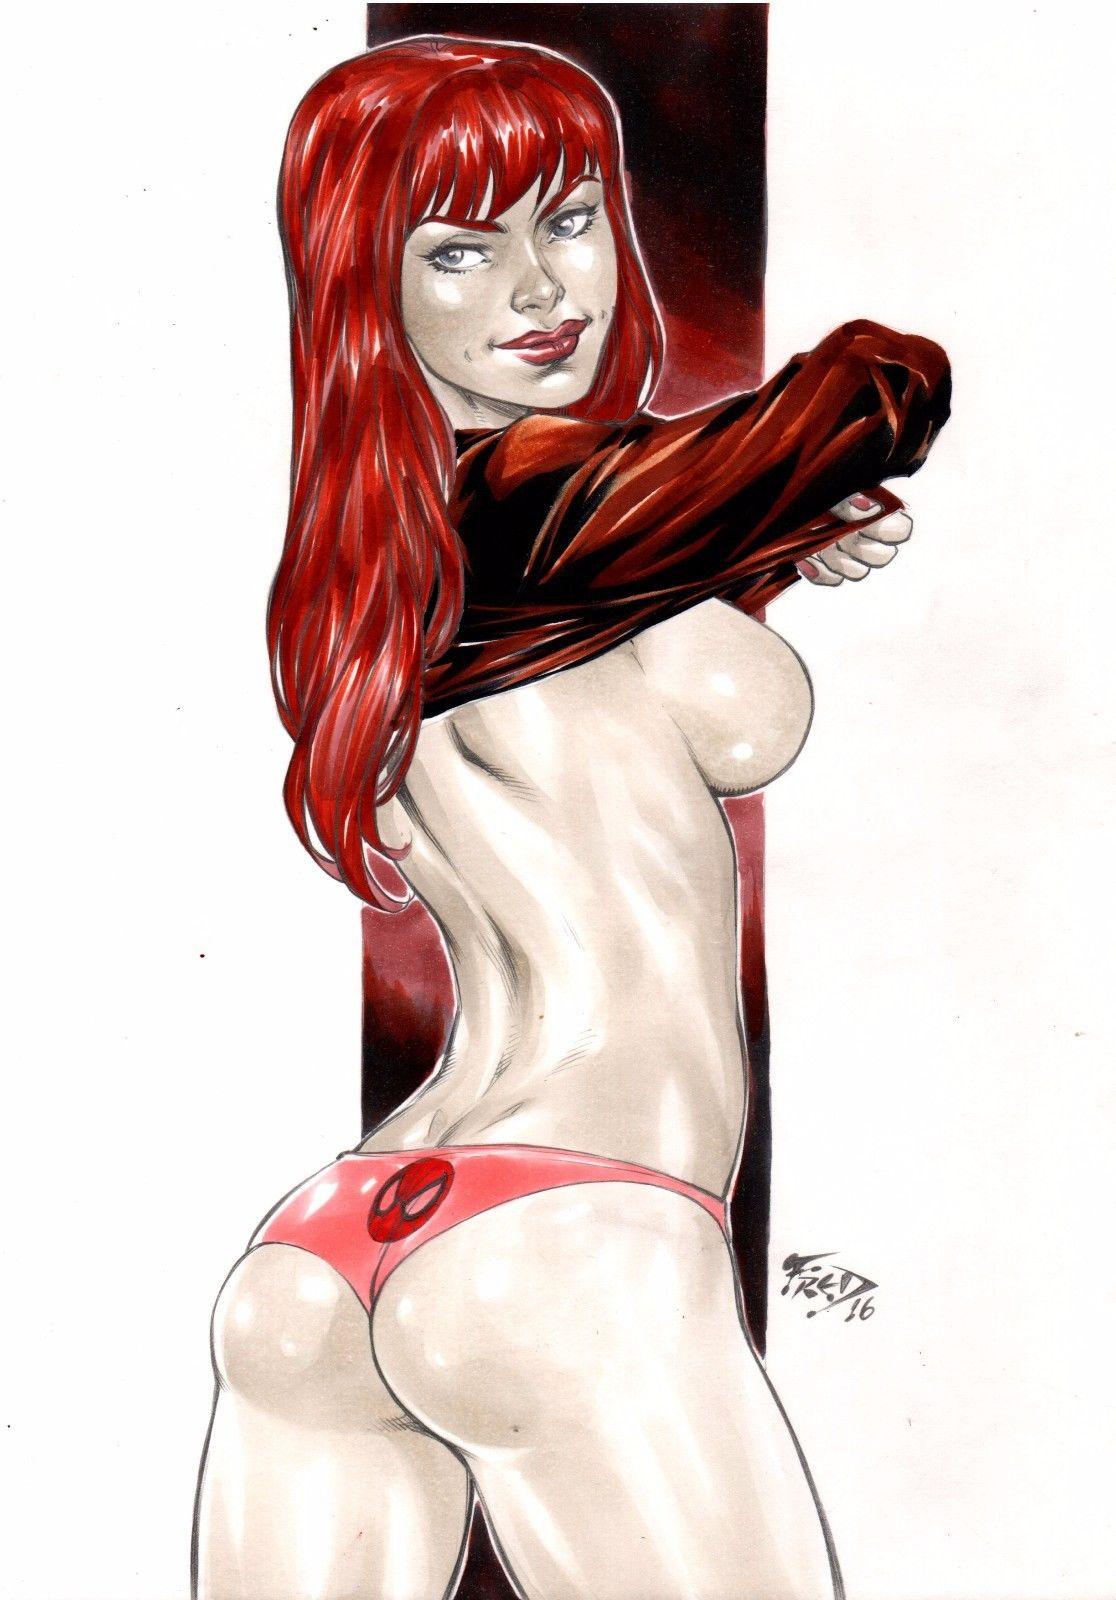 Jane mary nude secret adult free hardcore porn pics